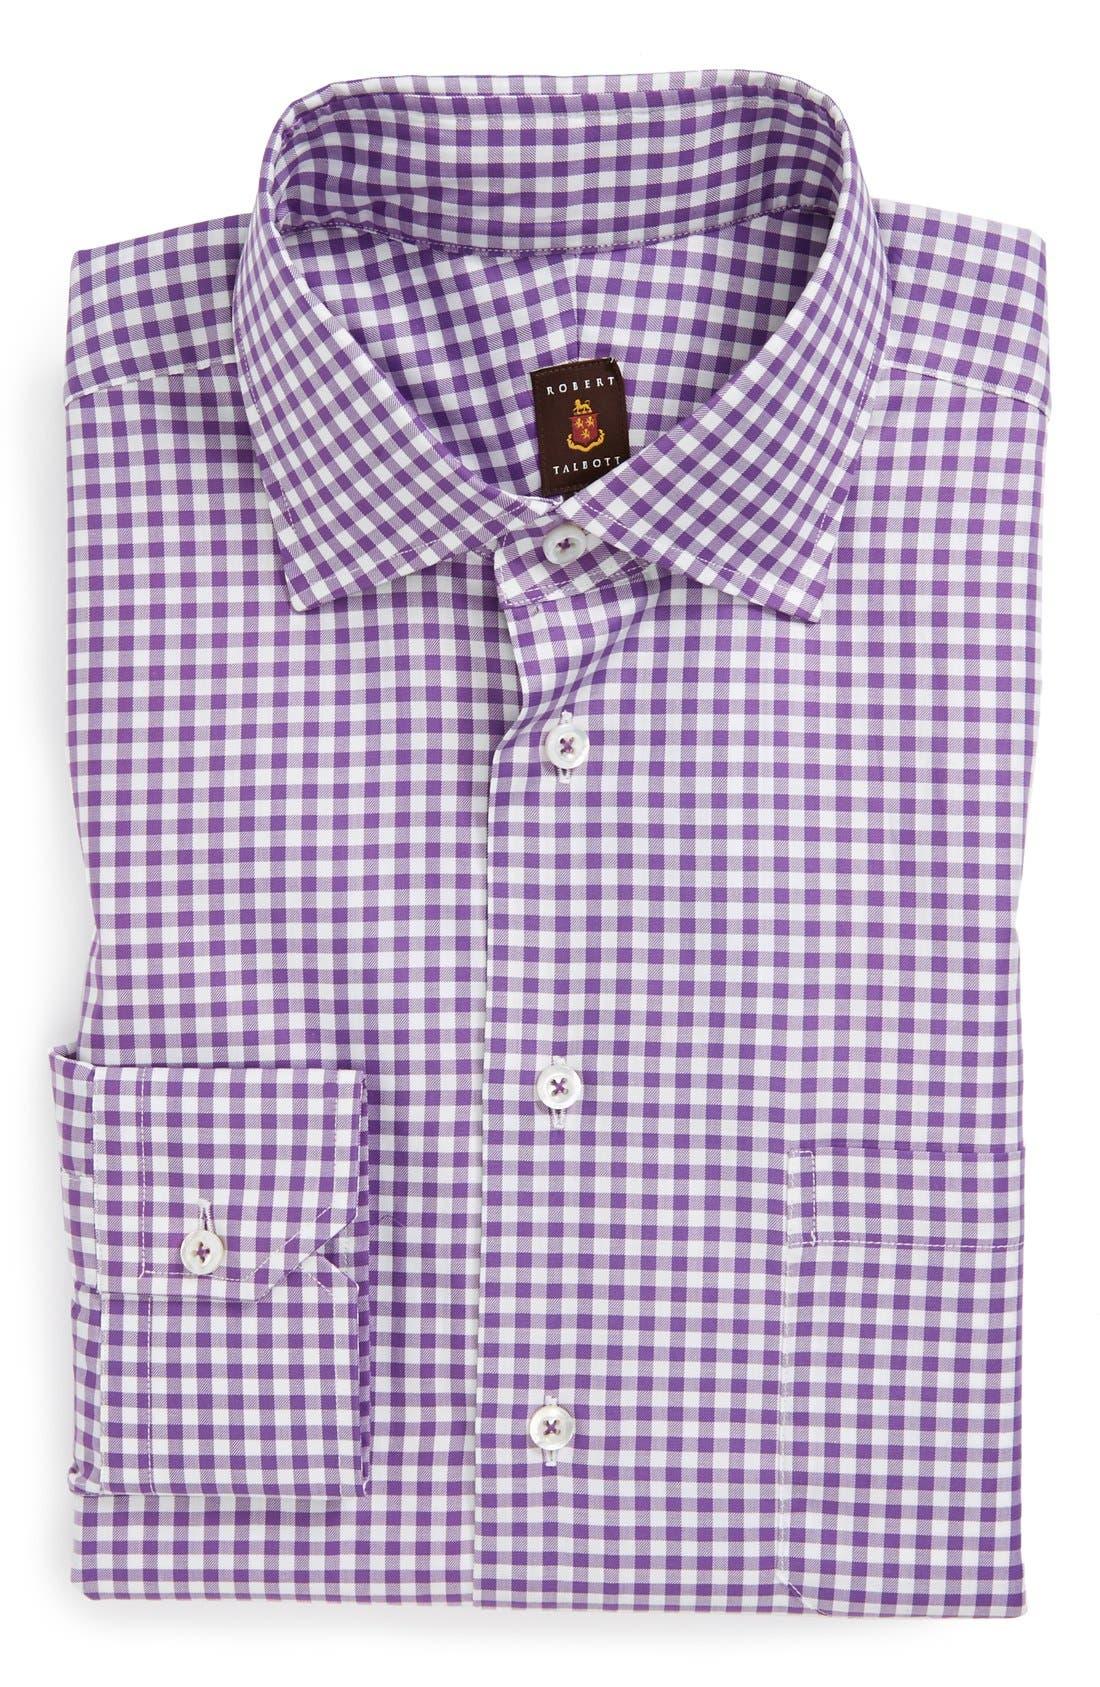 Alternate Image 1 Selected - Robert Talbott Twill Check Classic Fit Dress shirt